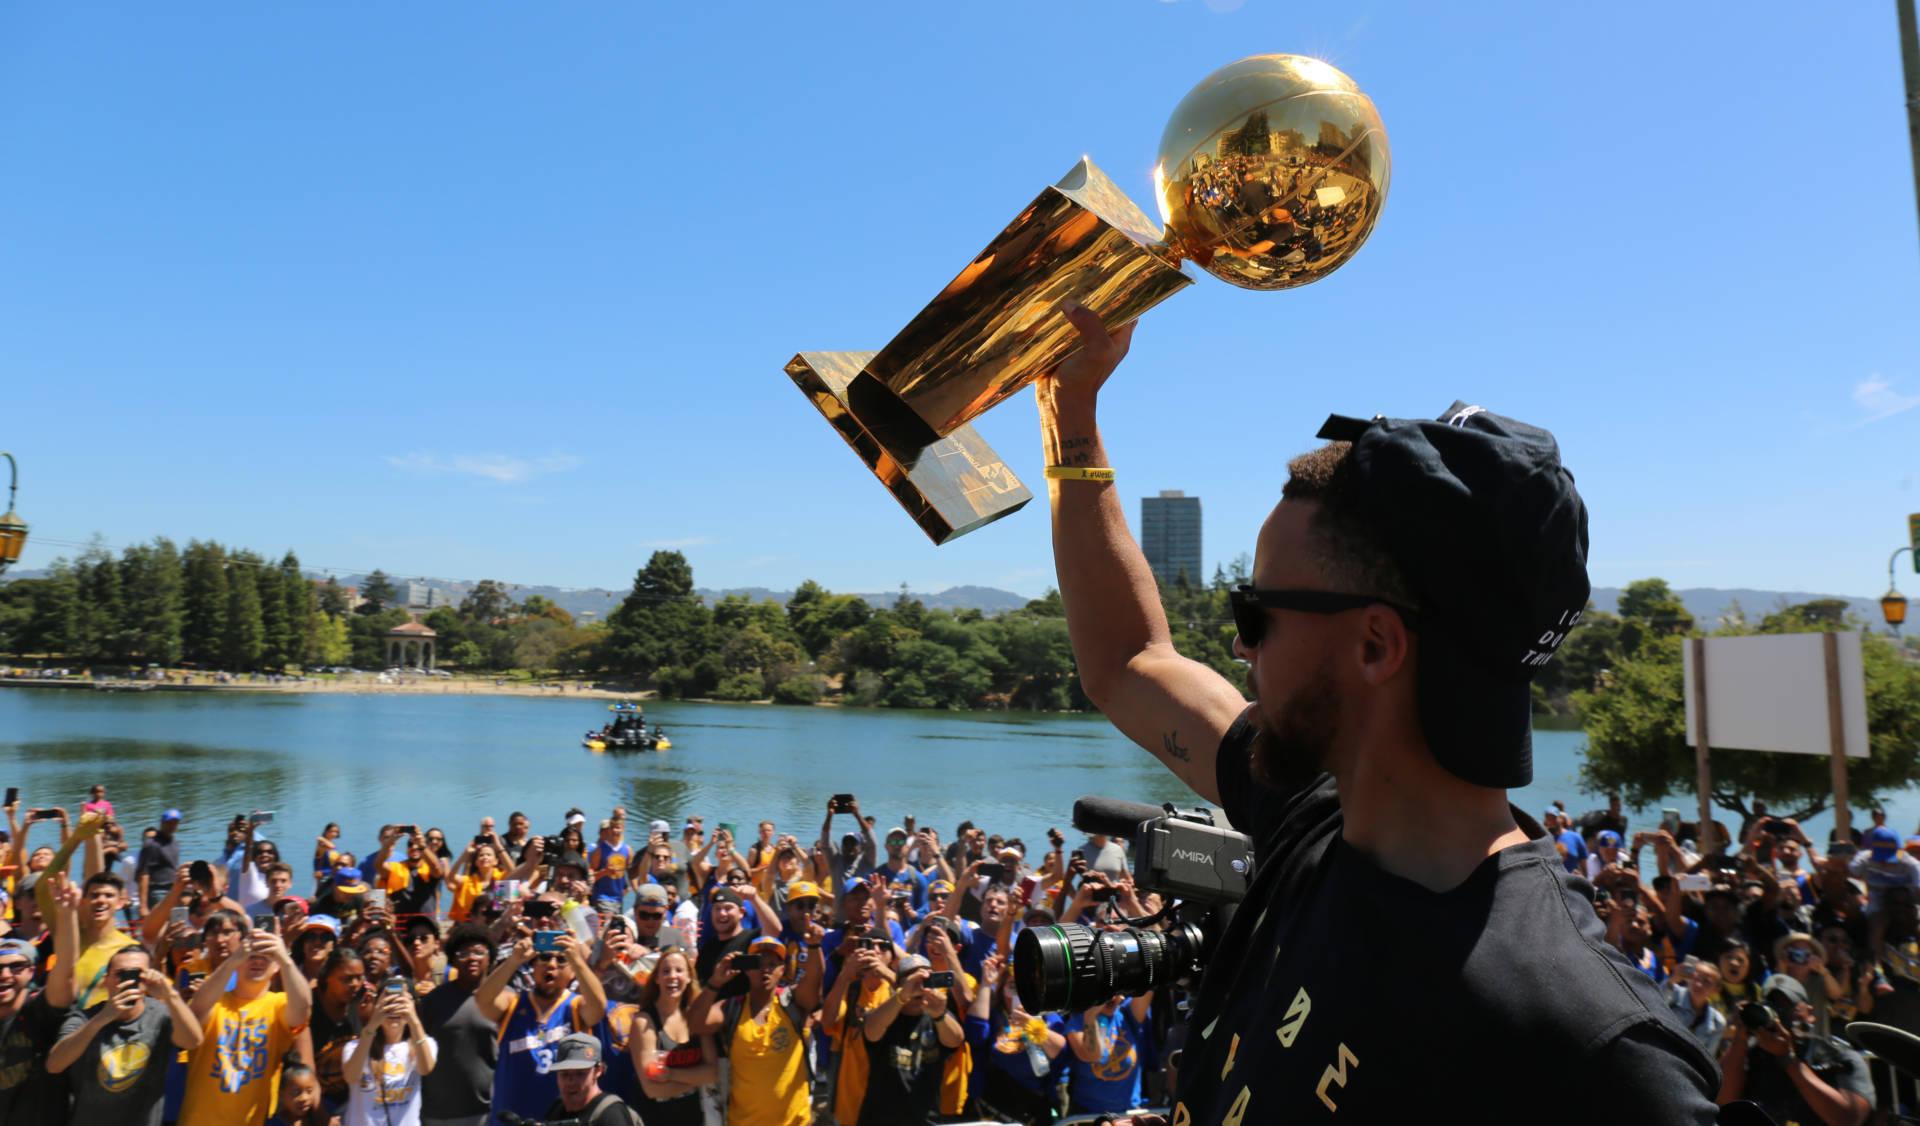 Stephen Curry lifts the NBA Championship trophy to Warriors fans lining Lake Merritt. Adam Grossberg/KQED